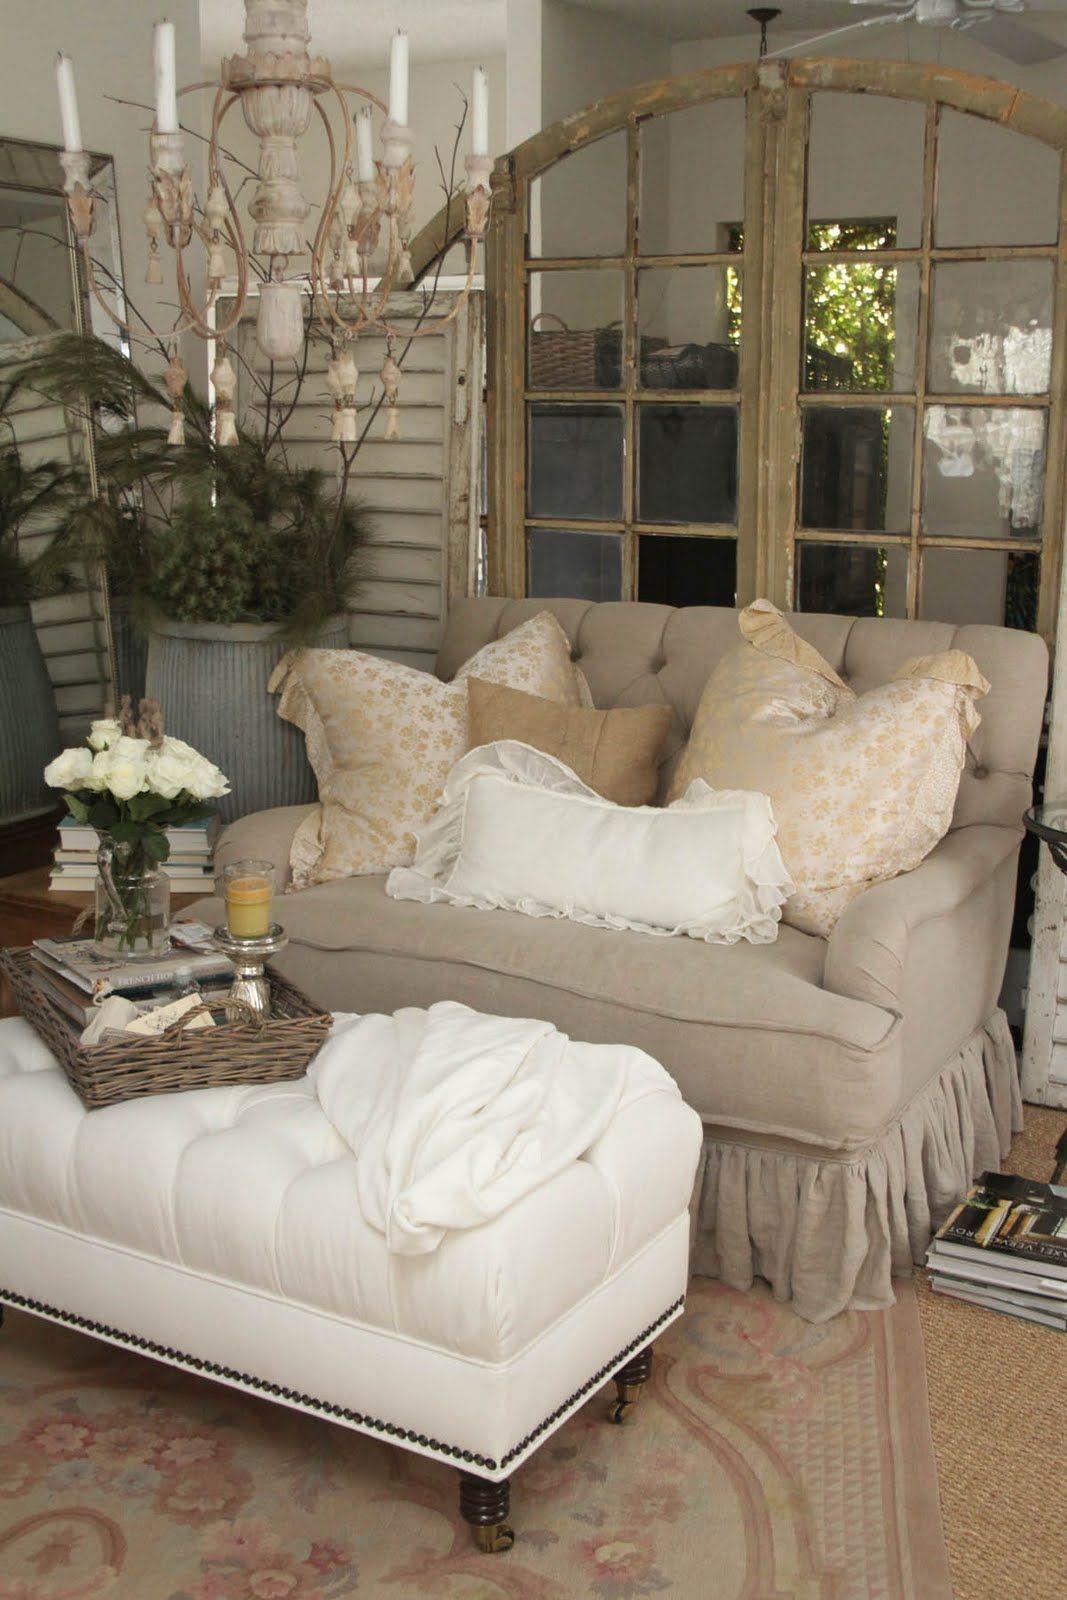 Australian Wool Comforter Home Home Decor Home Goods Decor